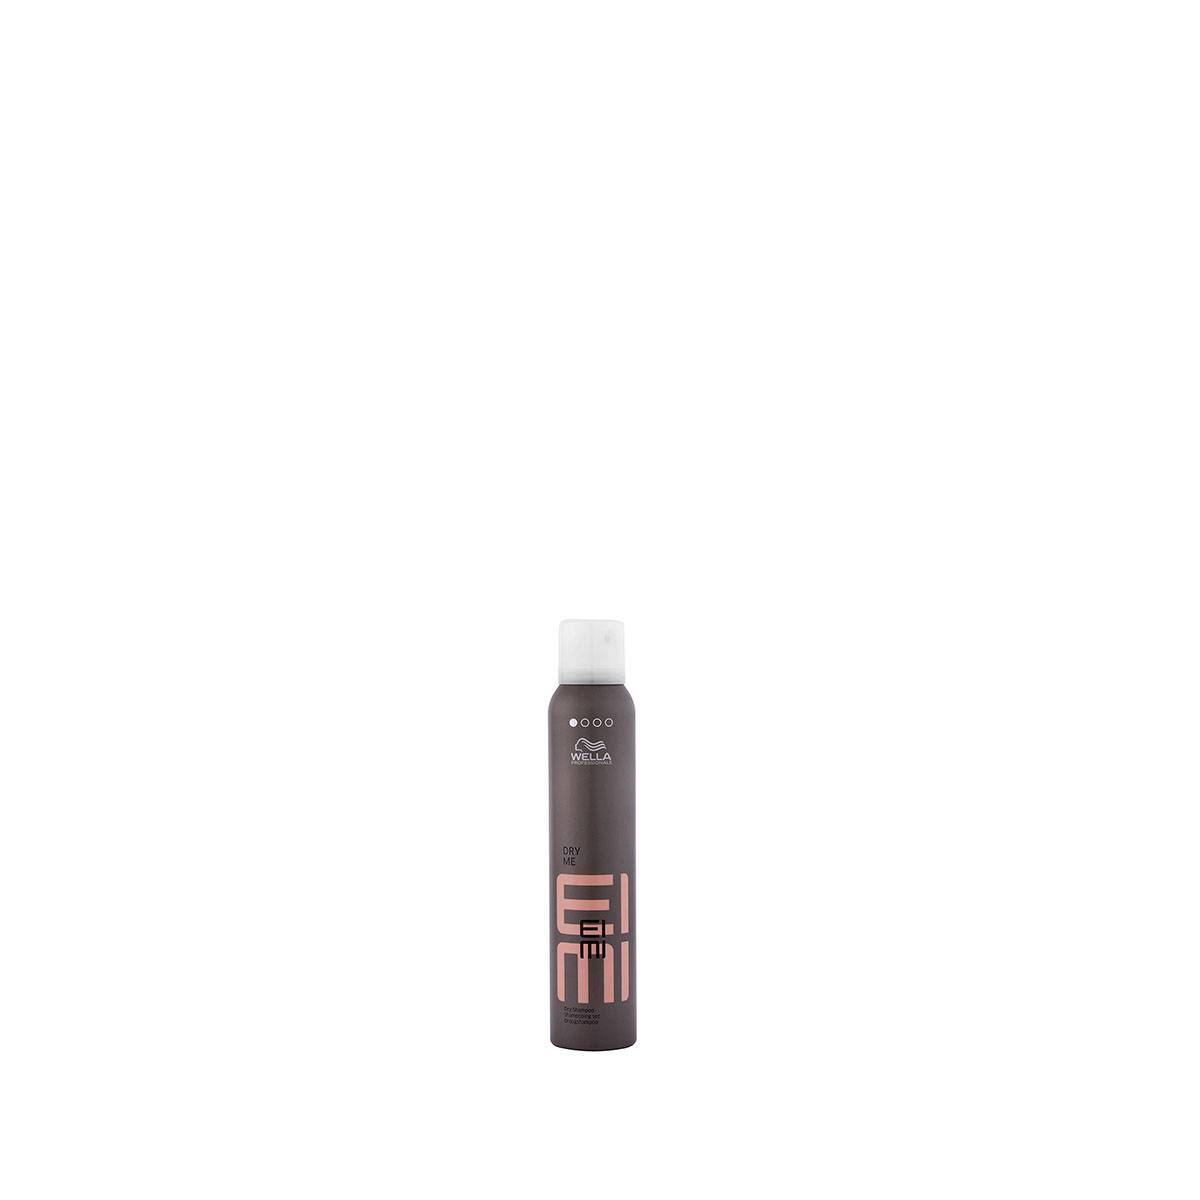 Eimi Dry Me Shampoo Secco 65ml